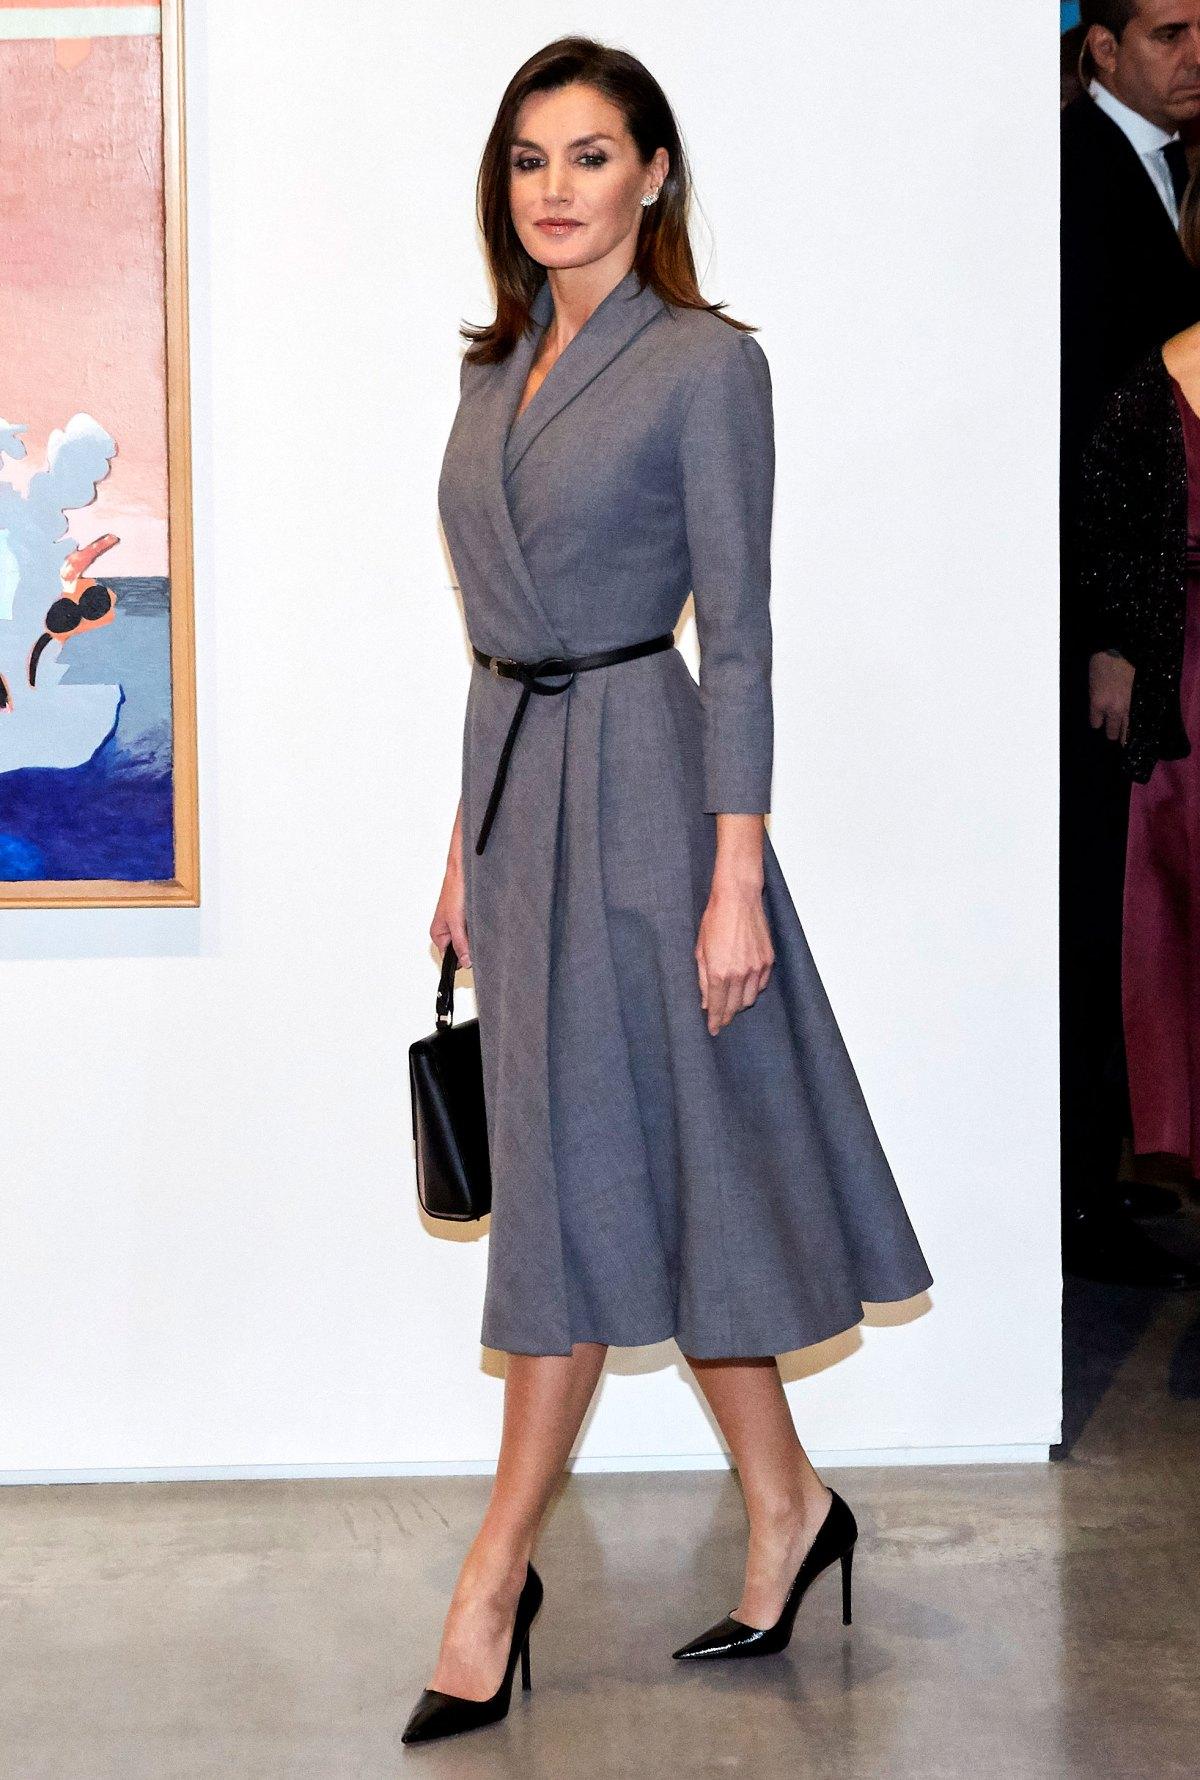 3b9b94e2abcba Queen Letizia of Spain Best Dresses, Outfits: Pics